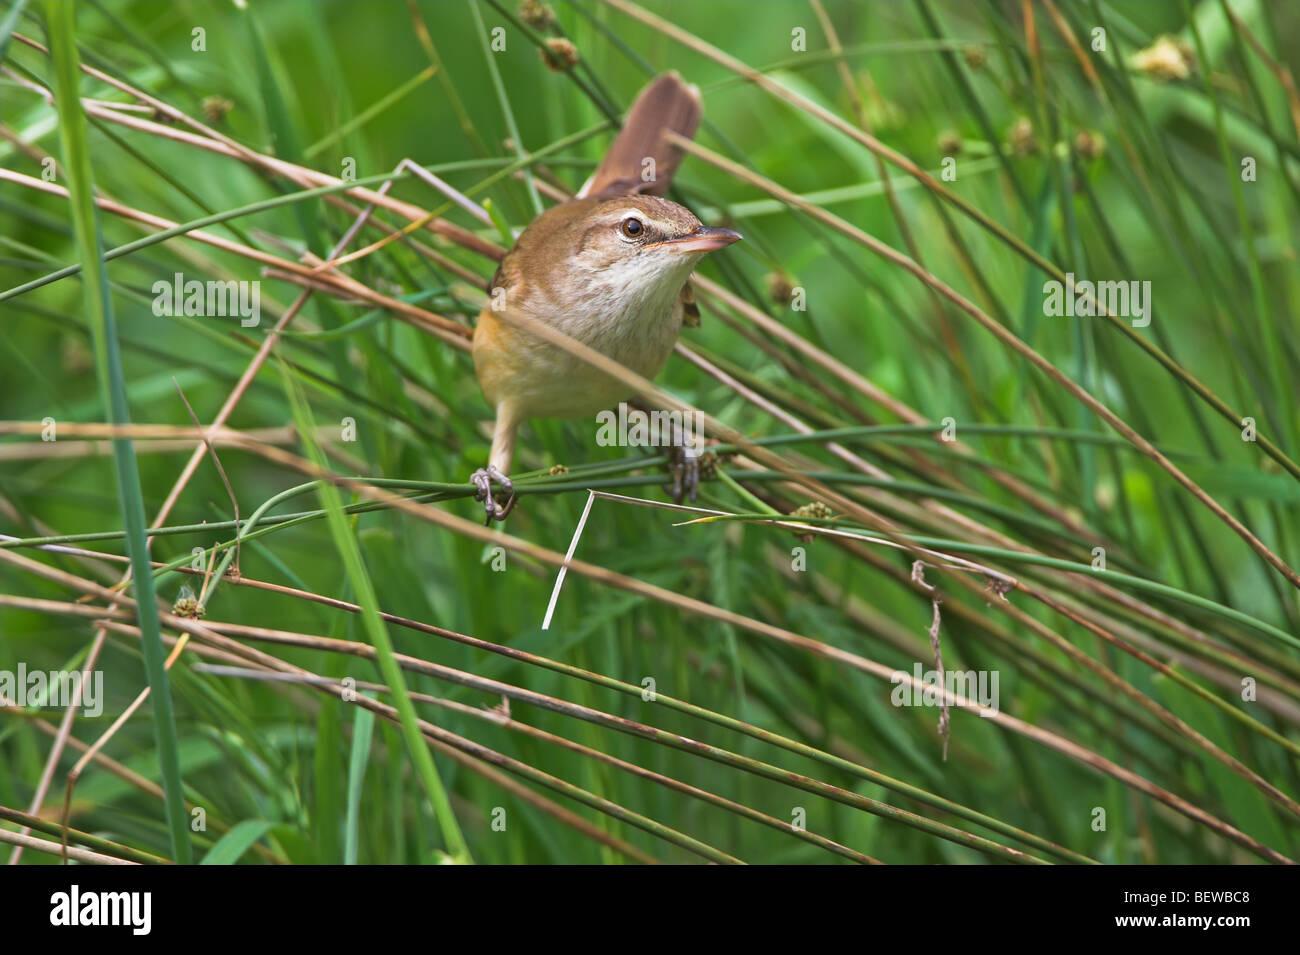 Great Reed Warbler (Acrocephalus arundinaceus) sitting among the reeds Stock Photo